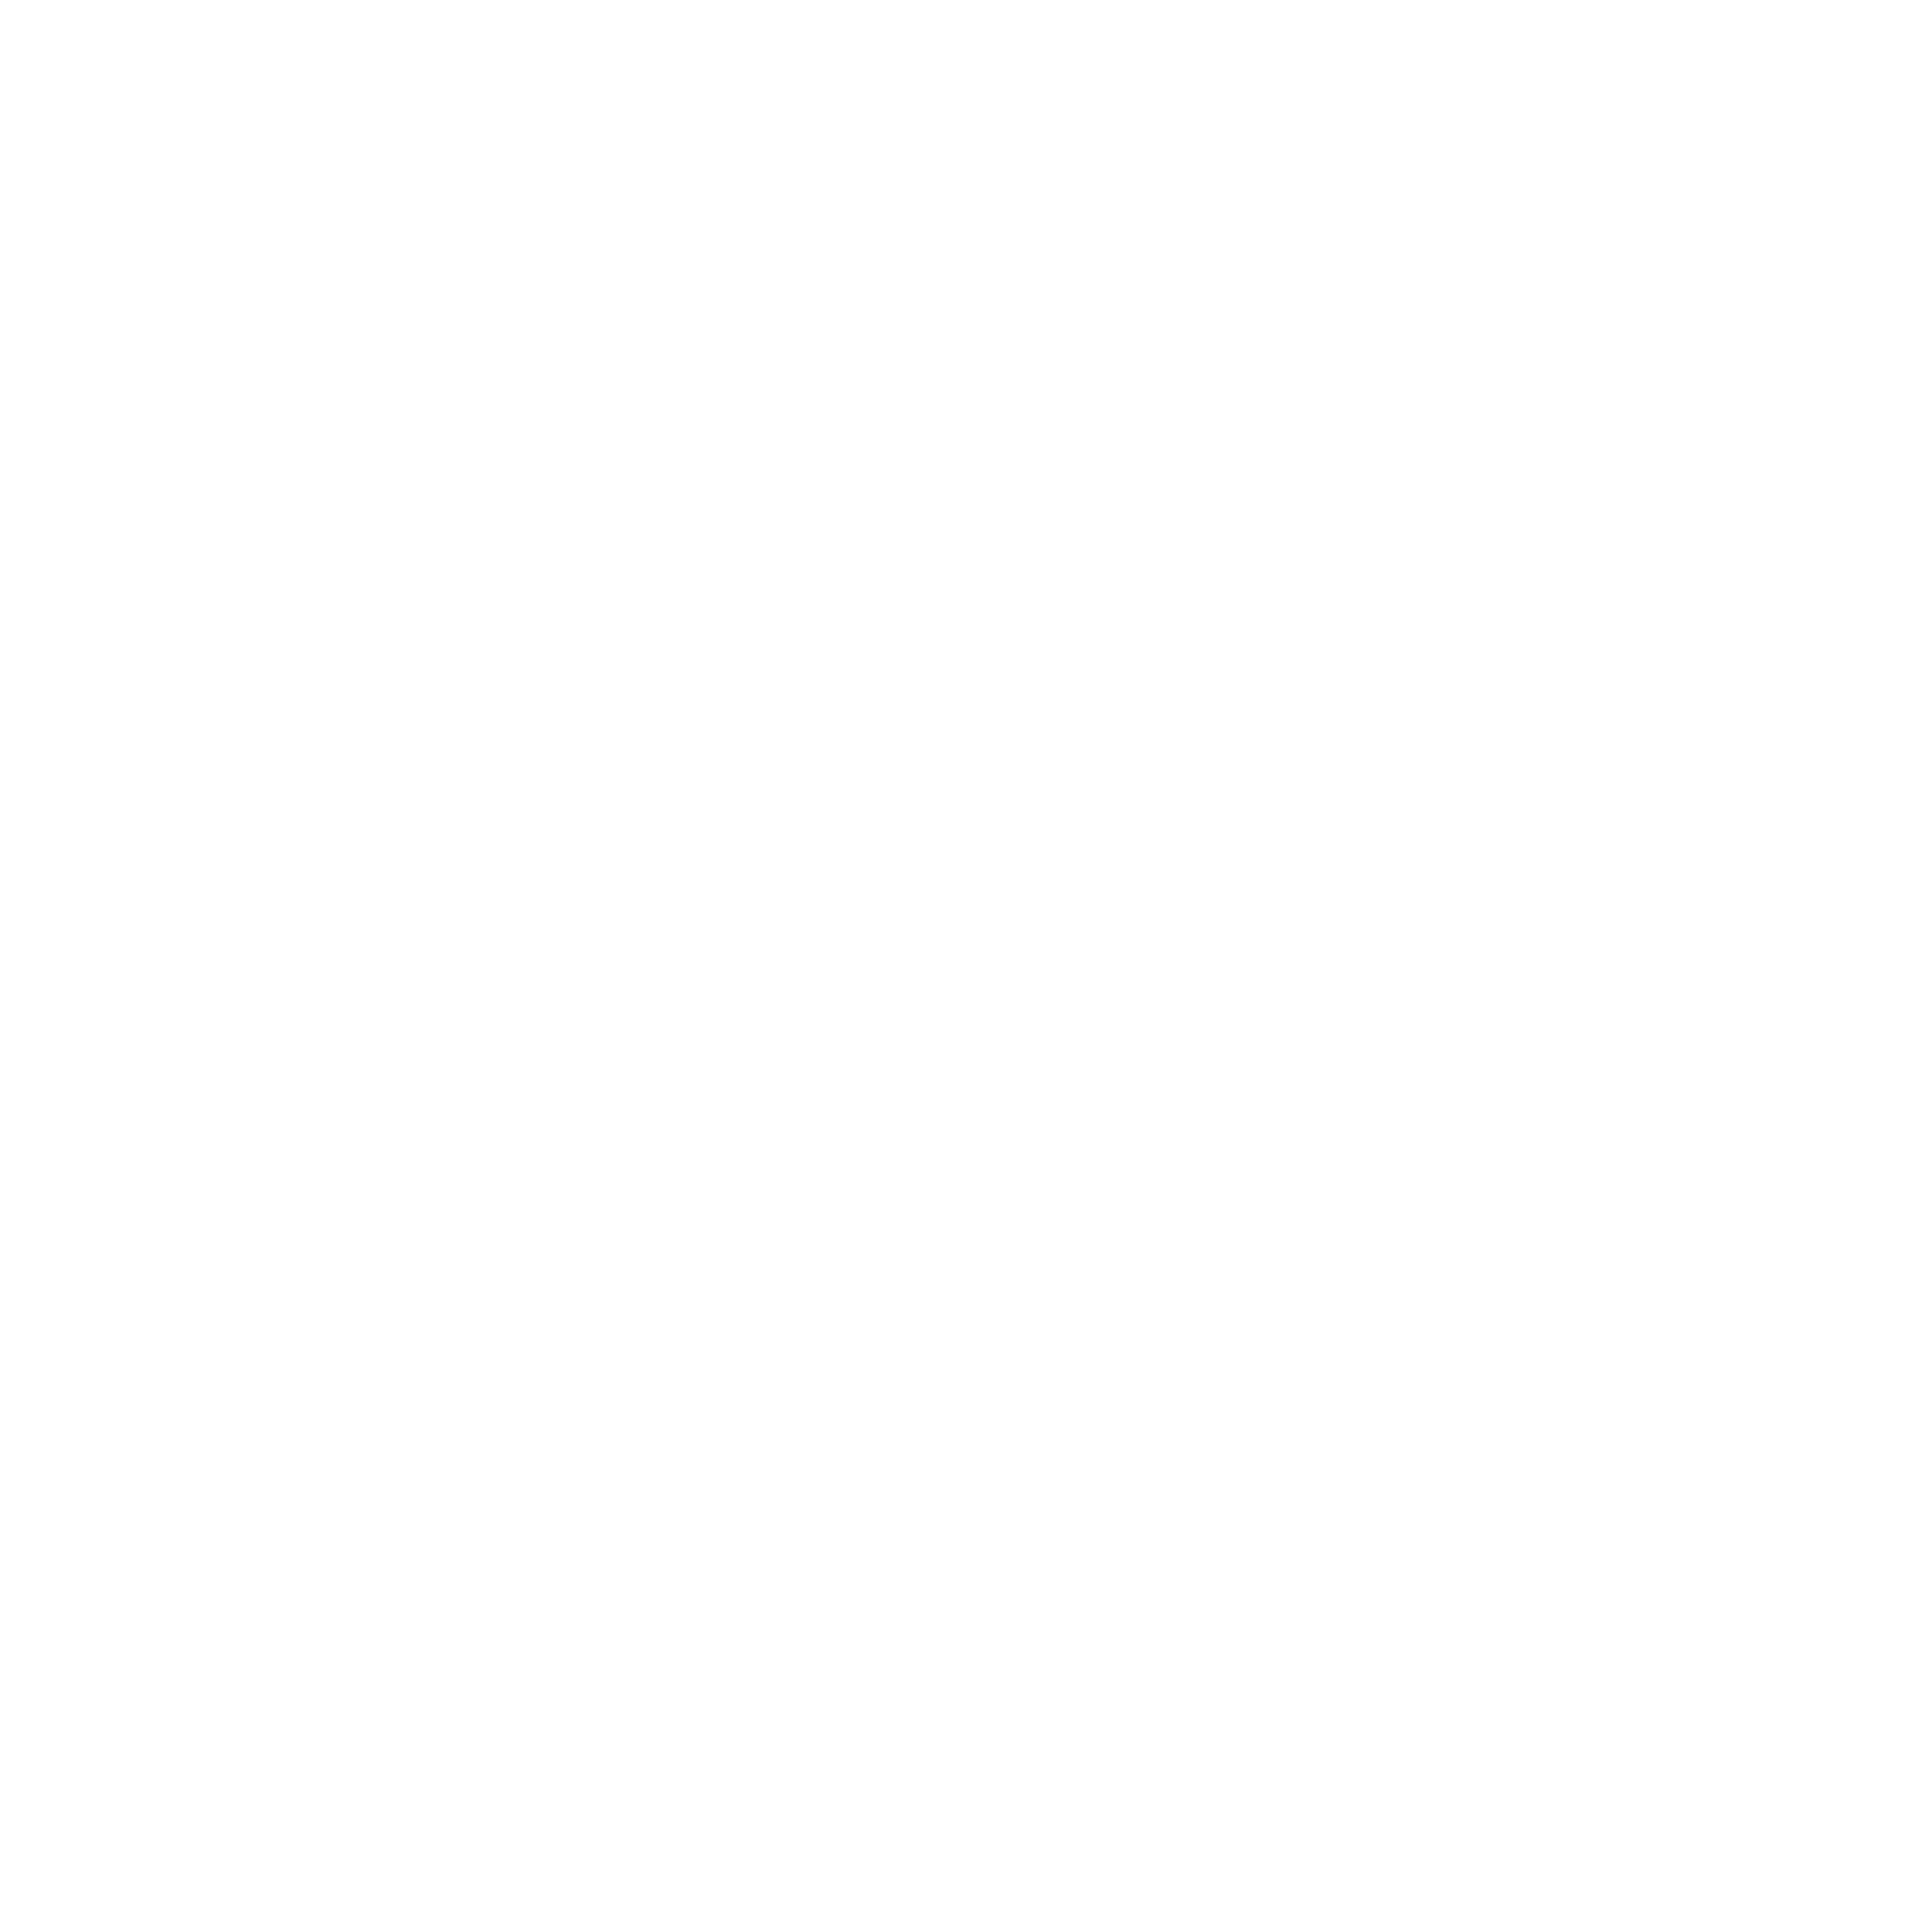 WasteTran